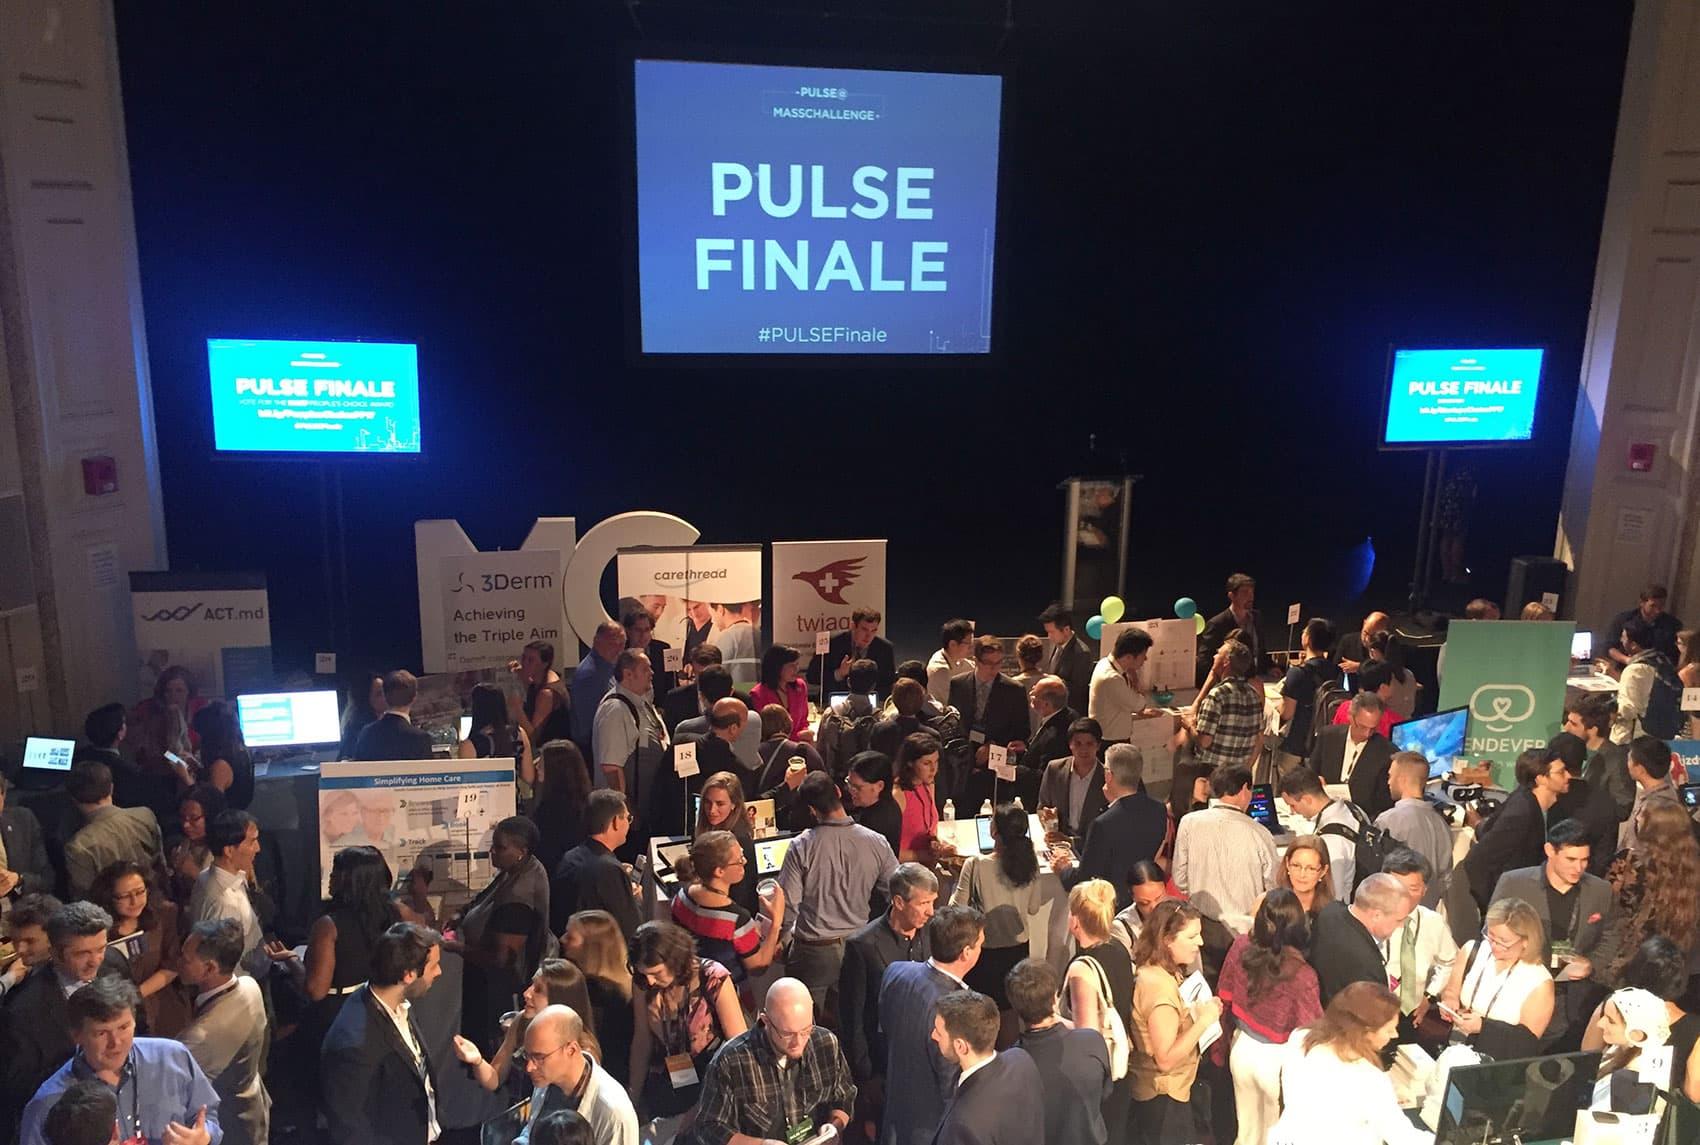 The PULSE event Tuesday night in Boston (Rachel Zimmerman/WBUR)